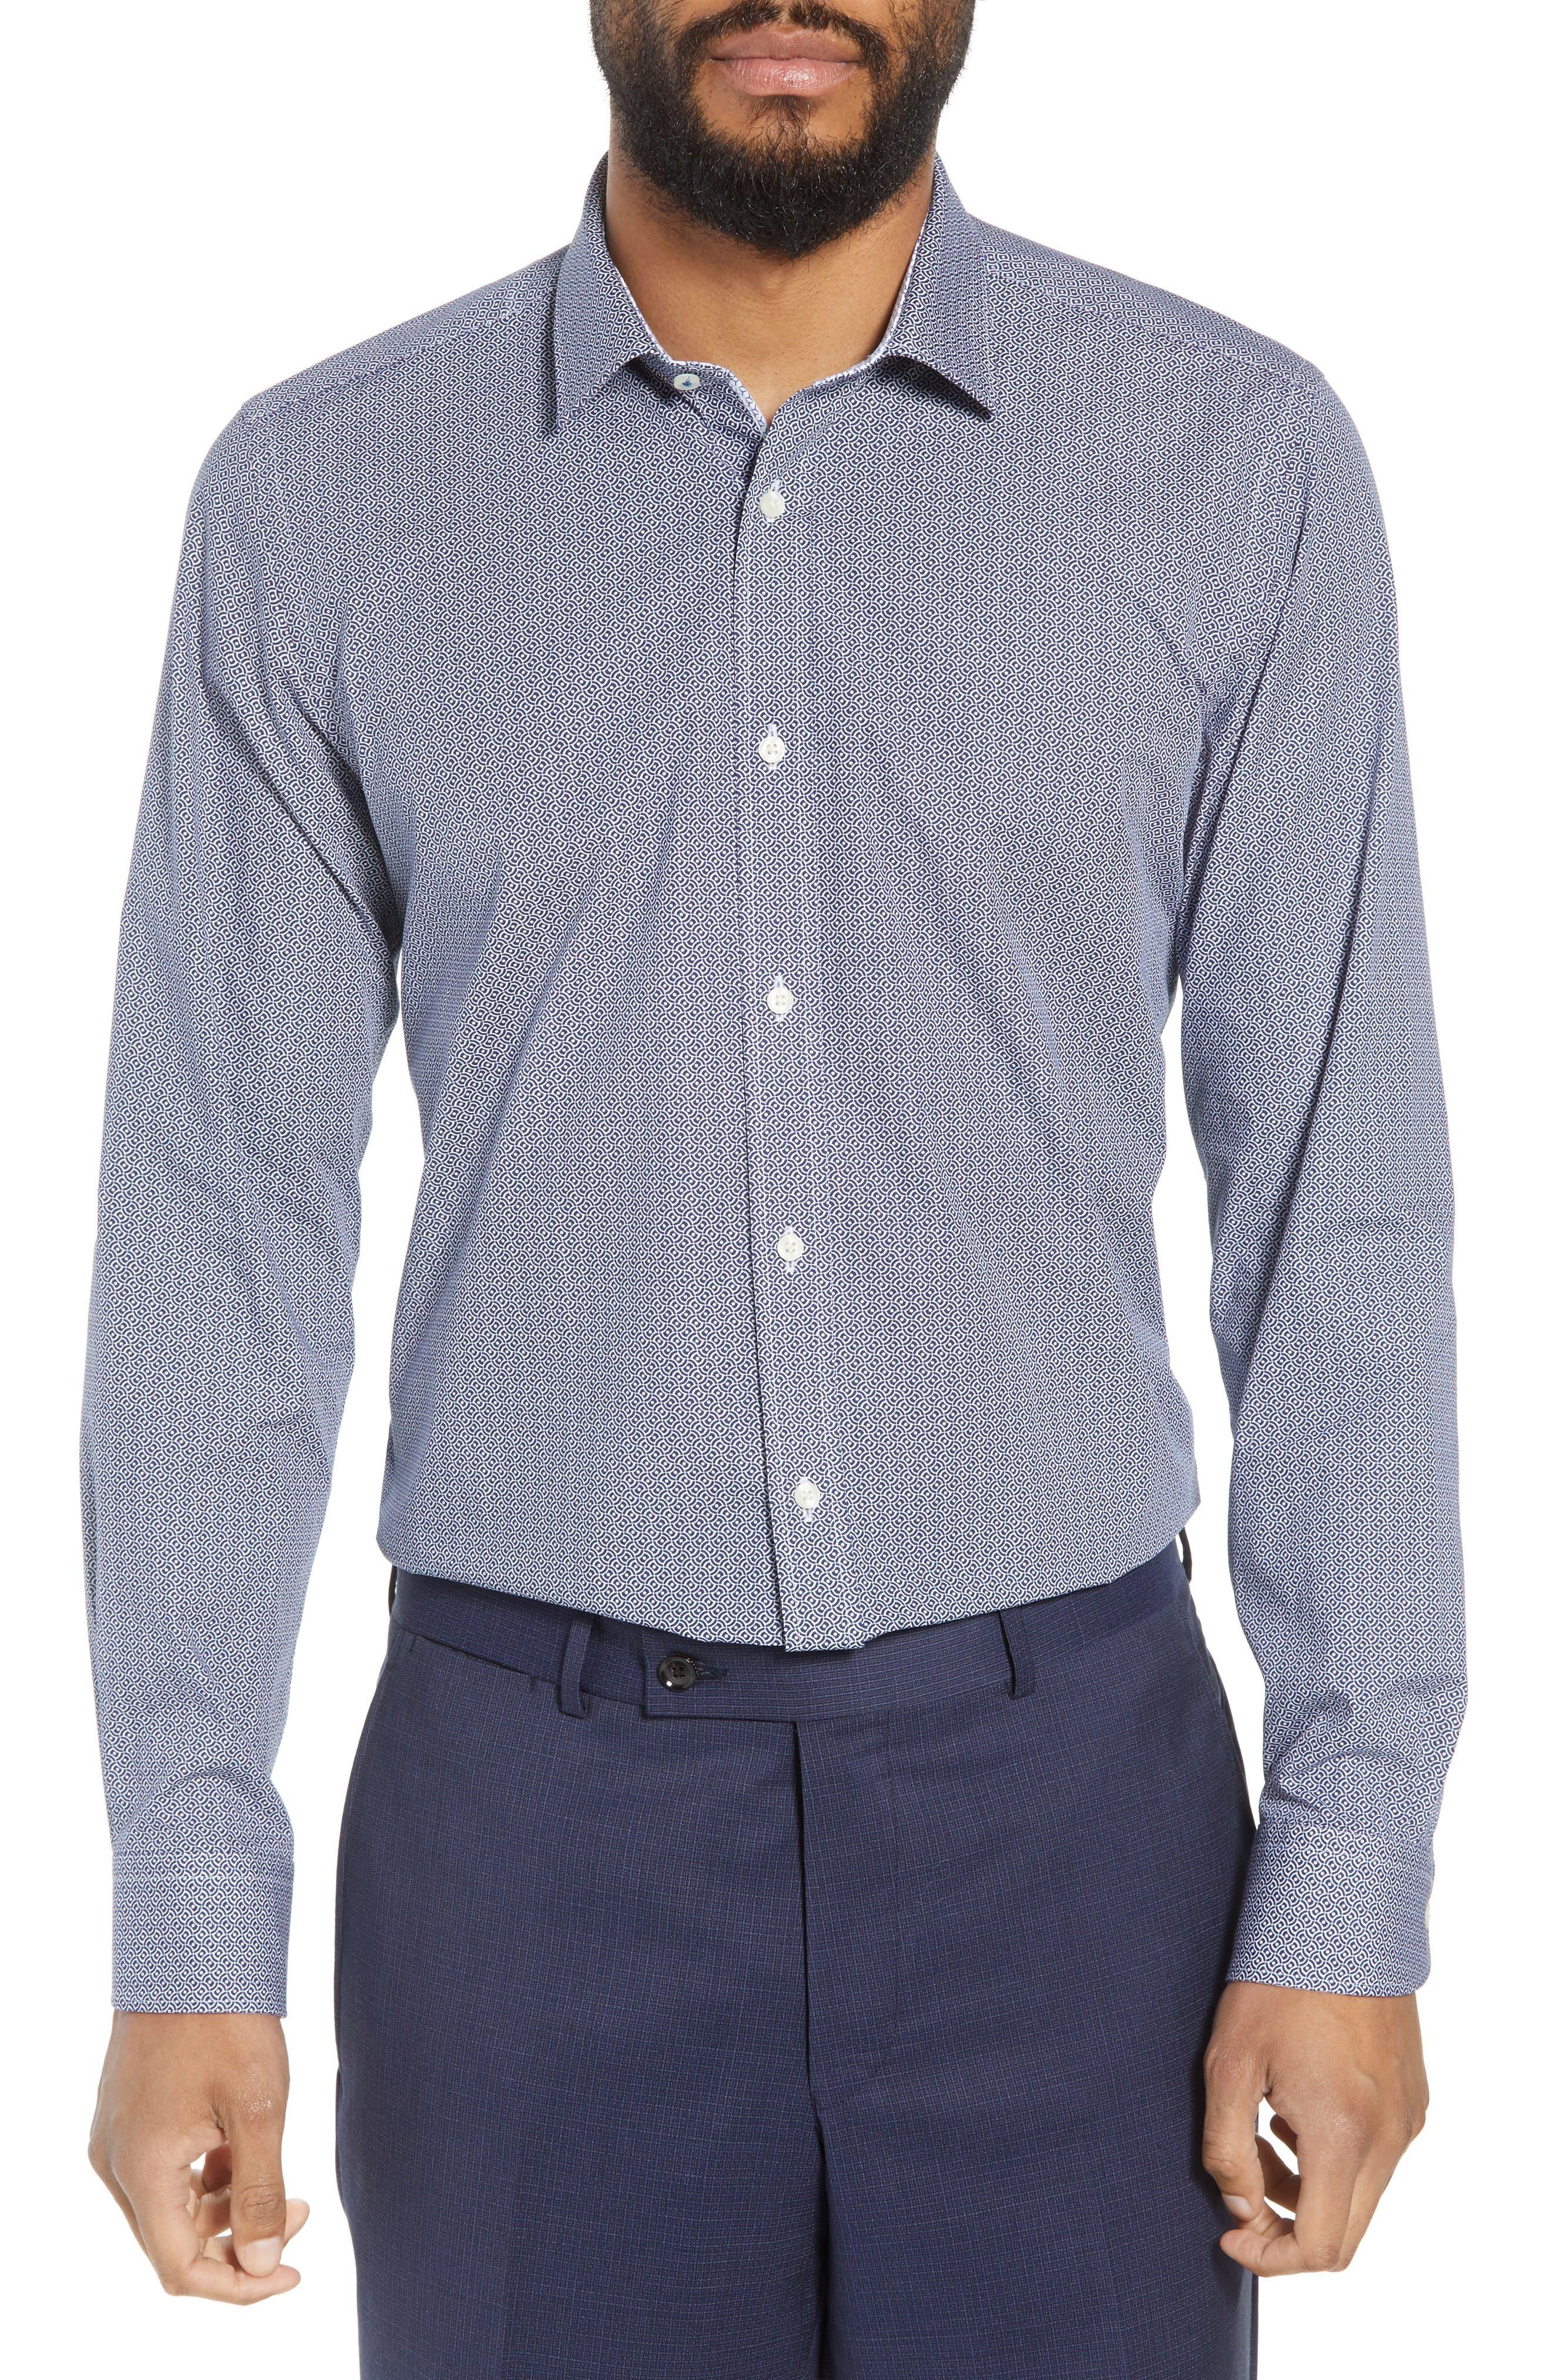 Footz Slim Fit Geometric Dress Shirt,                             Main thumbnail 1, color,                             NAVY